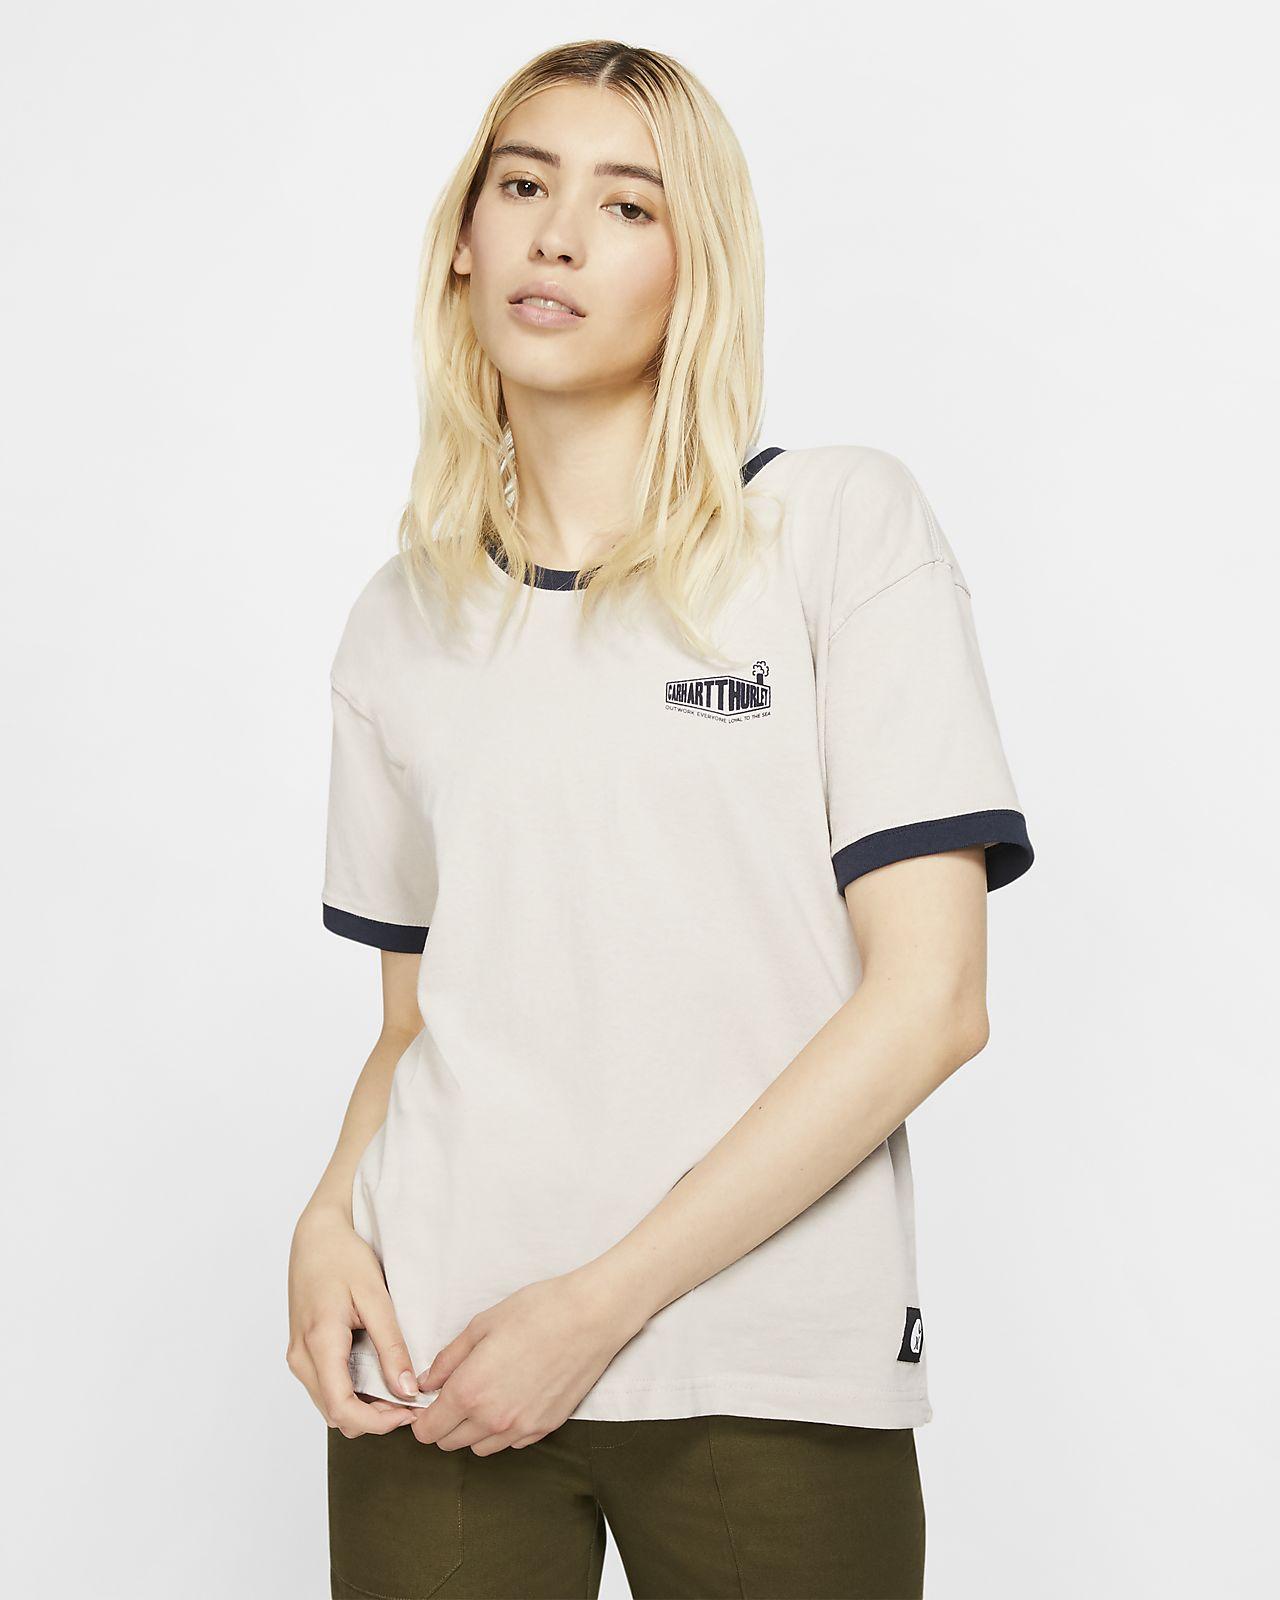 Hurley x Carhartt BFY Ringer Women's Premium Fit T-Shirt